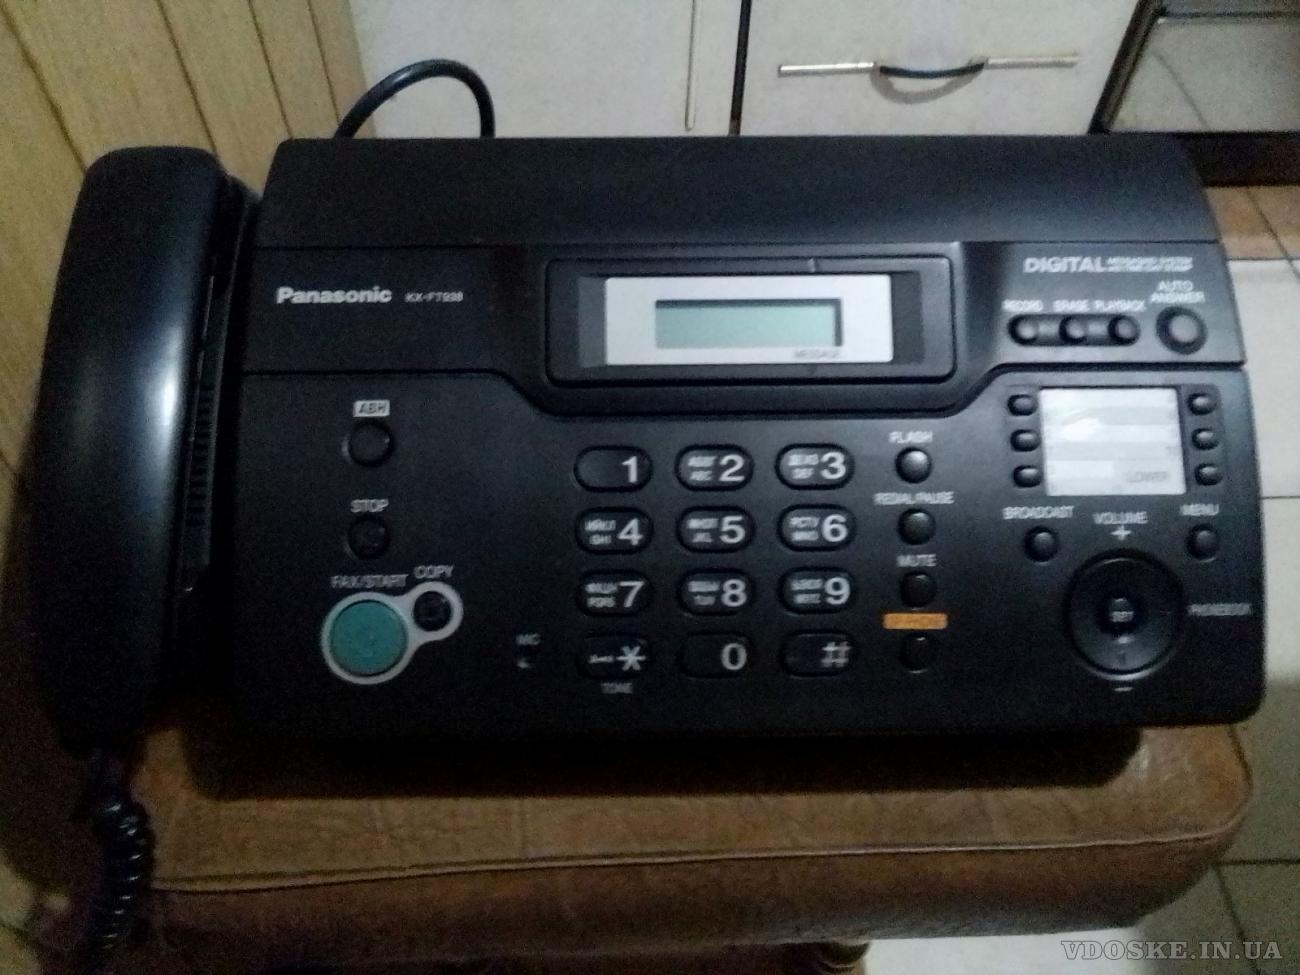 Телефон/факс Panasonic KX-FT938. (2)